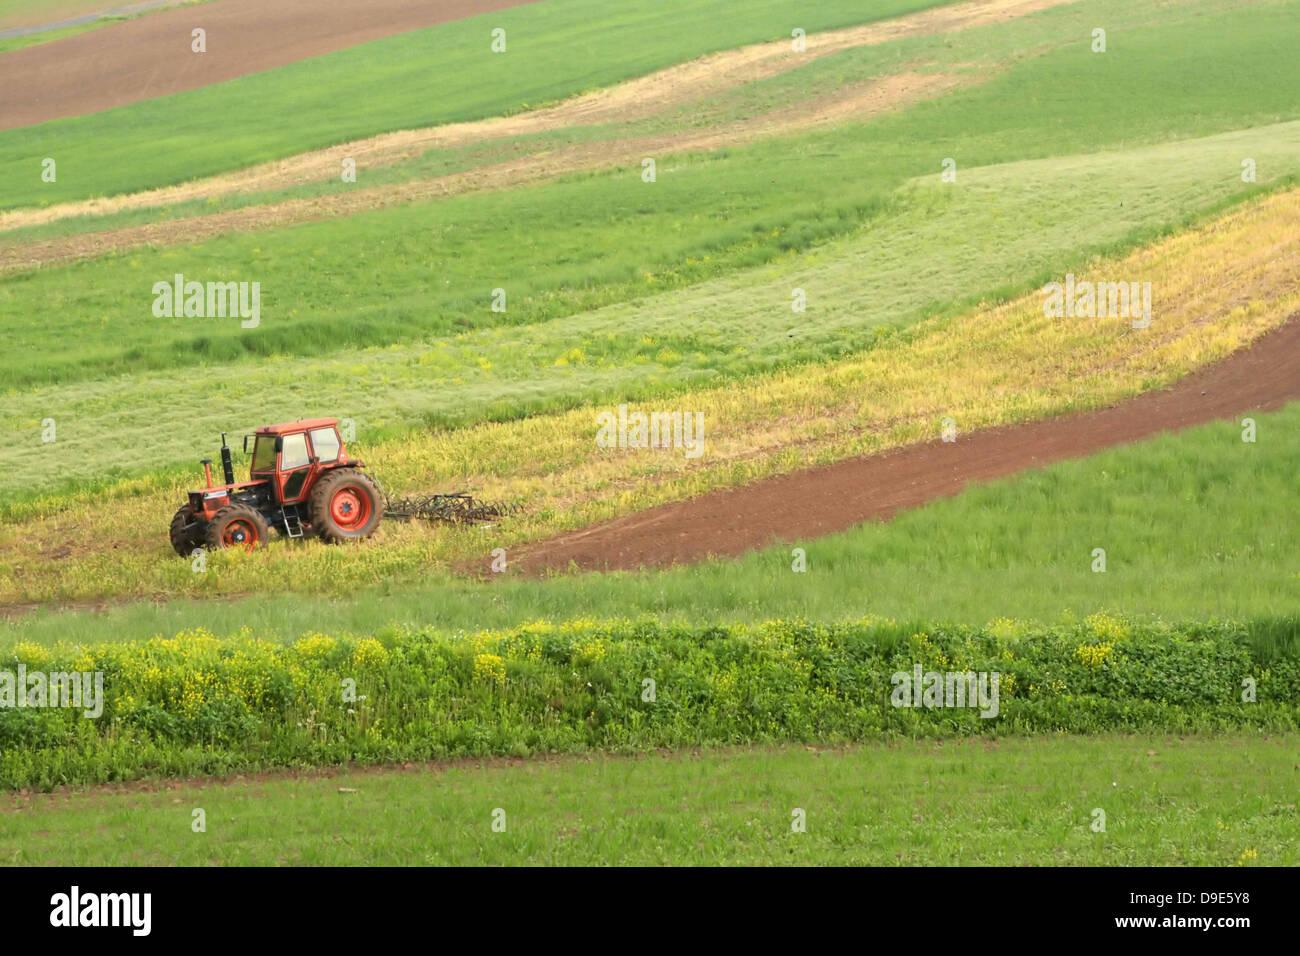 FARMER TRACTOR MORNING FOG BEECH CREEK, CLINTON COUNTY PENNSYLVANIA, USA SPRING FIELD PLANTING CROPS HAY CORN FARM - Stock Image